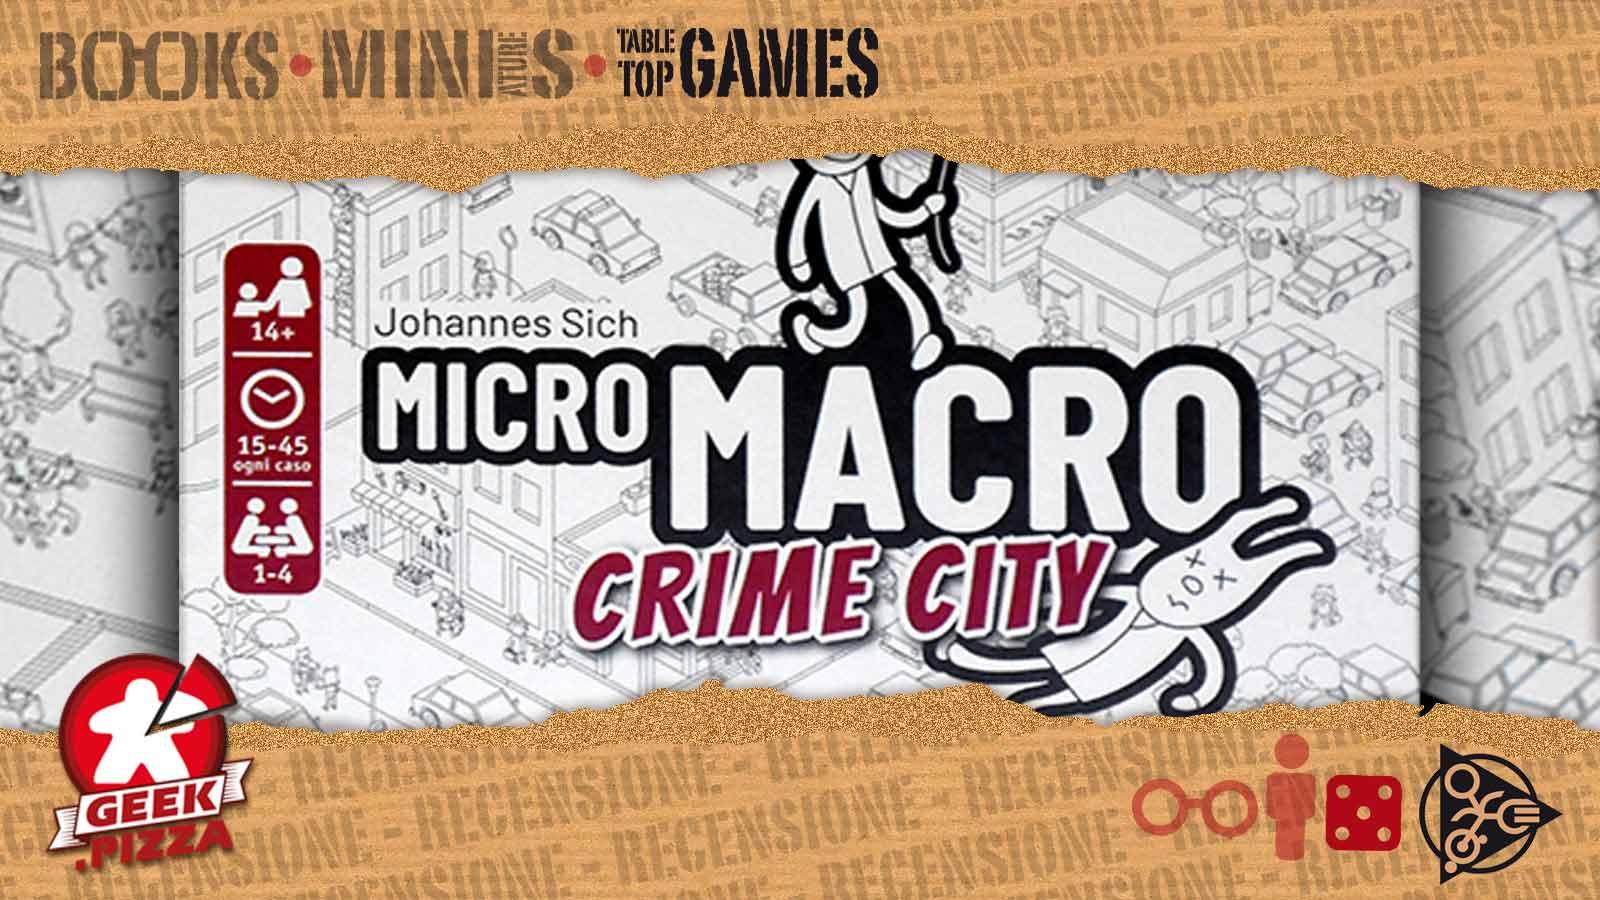 TT Games: Micromacro Crime City